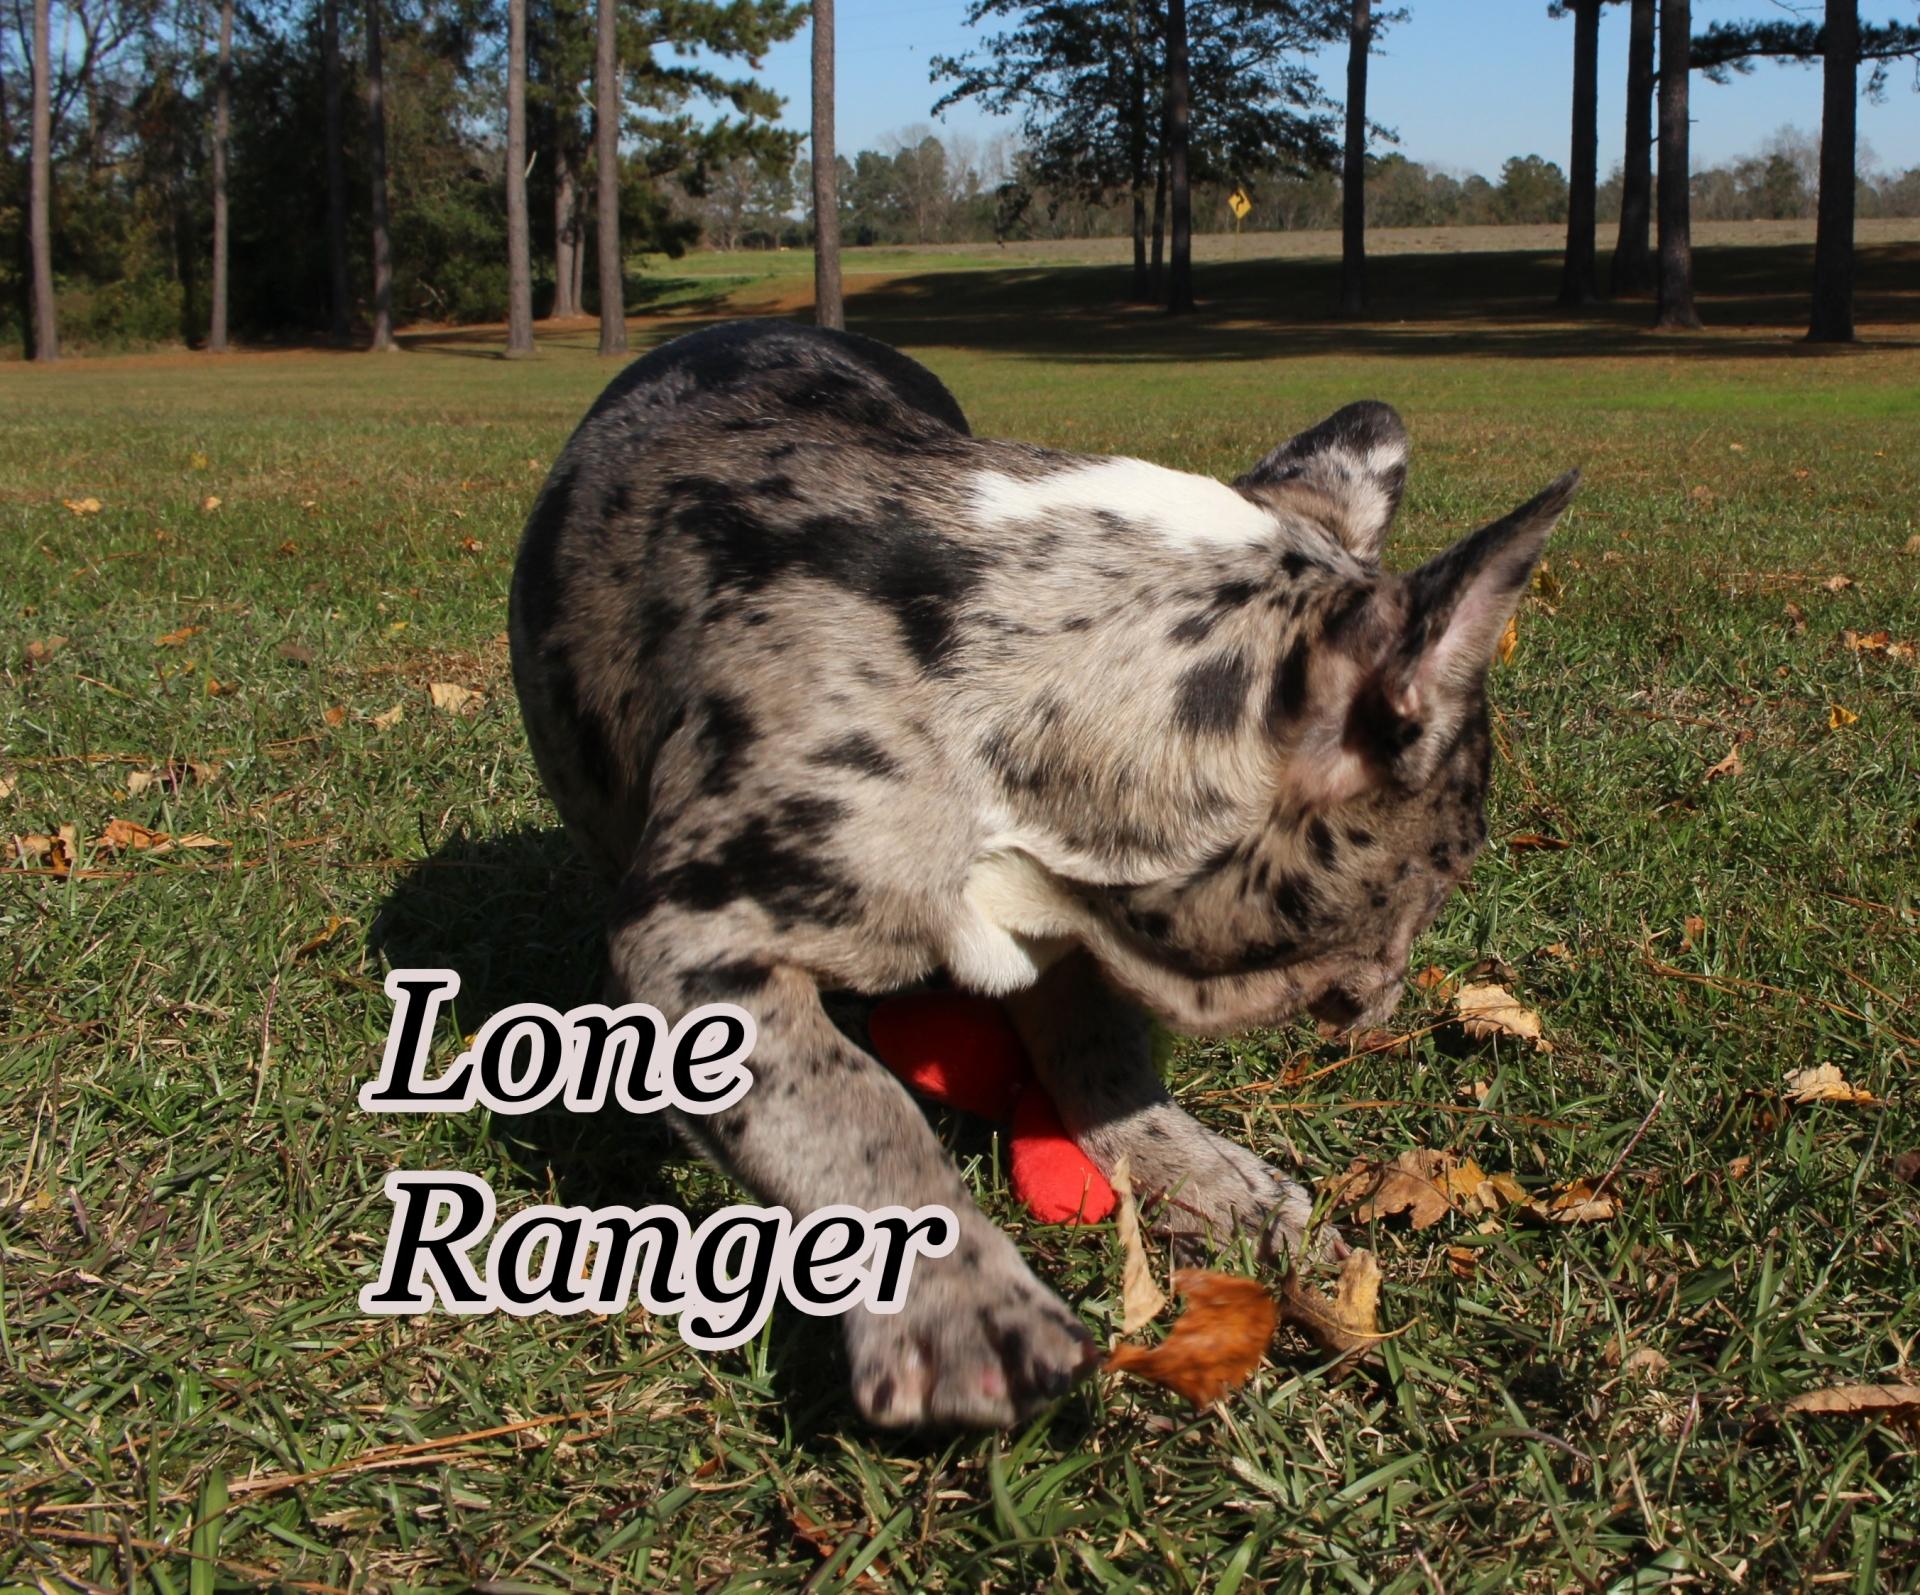 #FrenchBulldogPuppies #MerleFrenchBulldog #Frenchie #AvailablePuppies #AKCRegFrenchBulldog #SouthernTerritoryFrenchies #LoneRanger